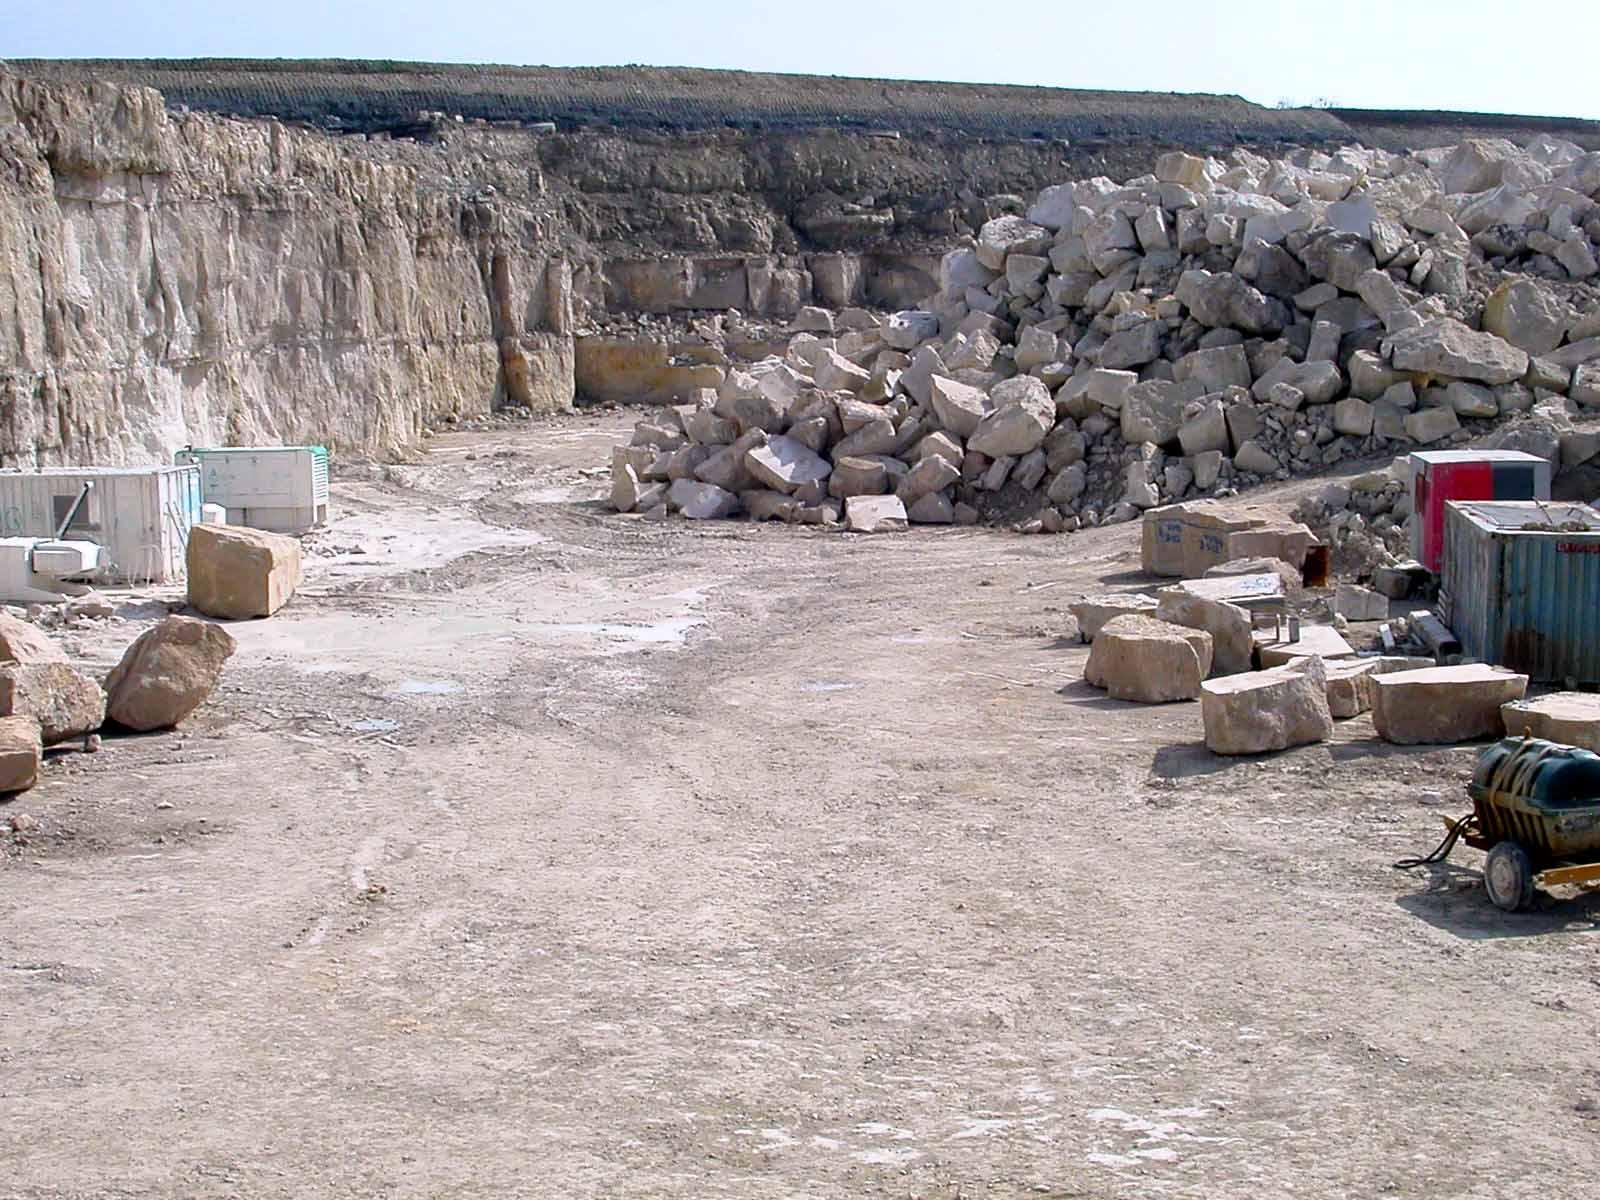 Stone Quarry Ireland Portland Stone Quarry on The